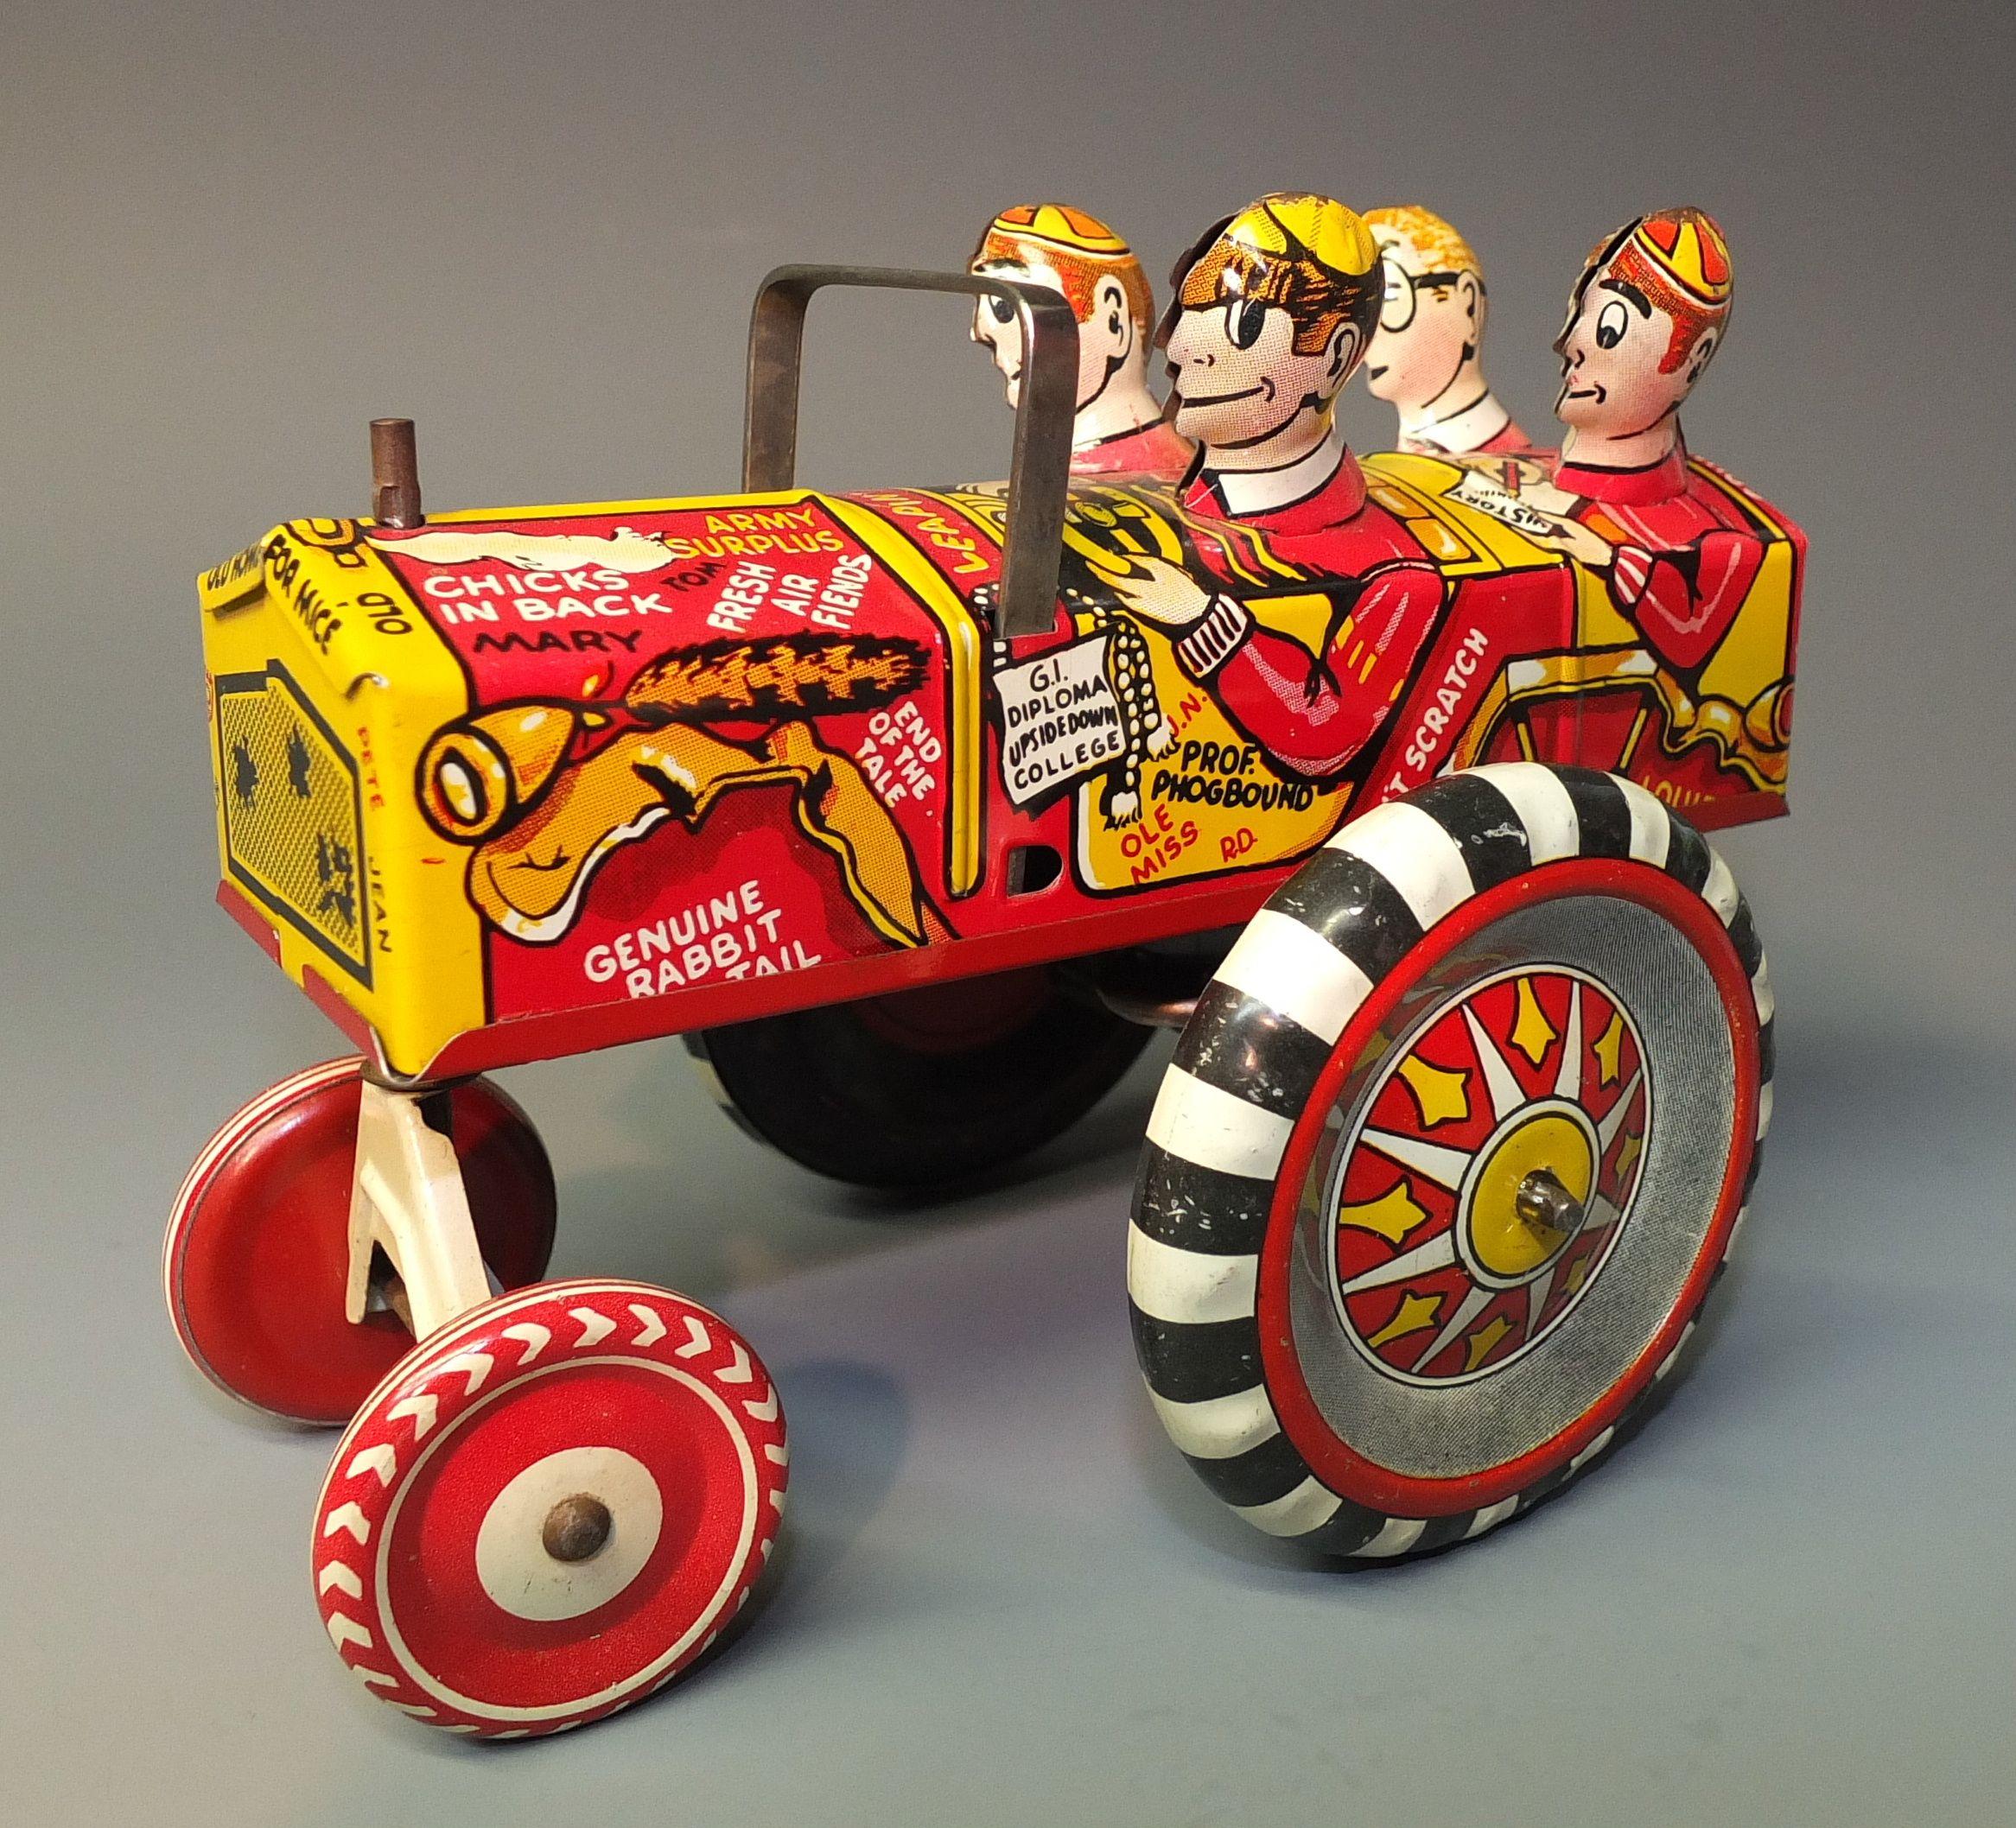 Bid Now On This Toy At Https Www Toysoftimespast Com Toys Vintage Toys Old Toys